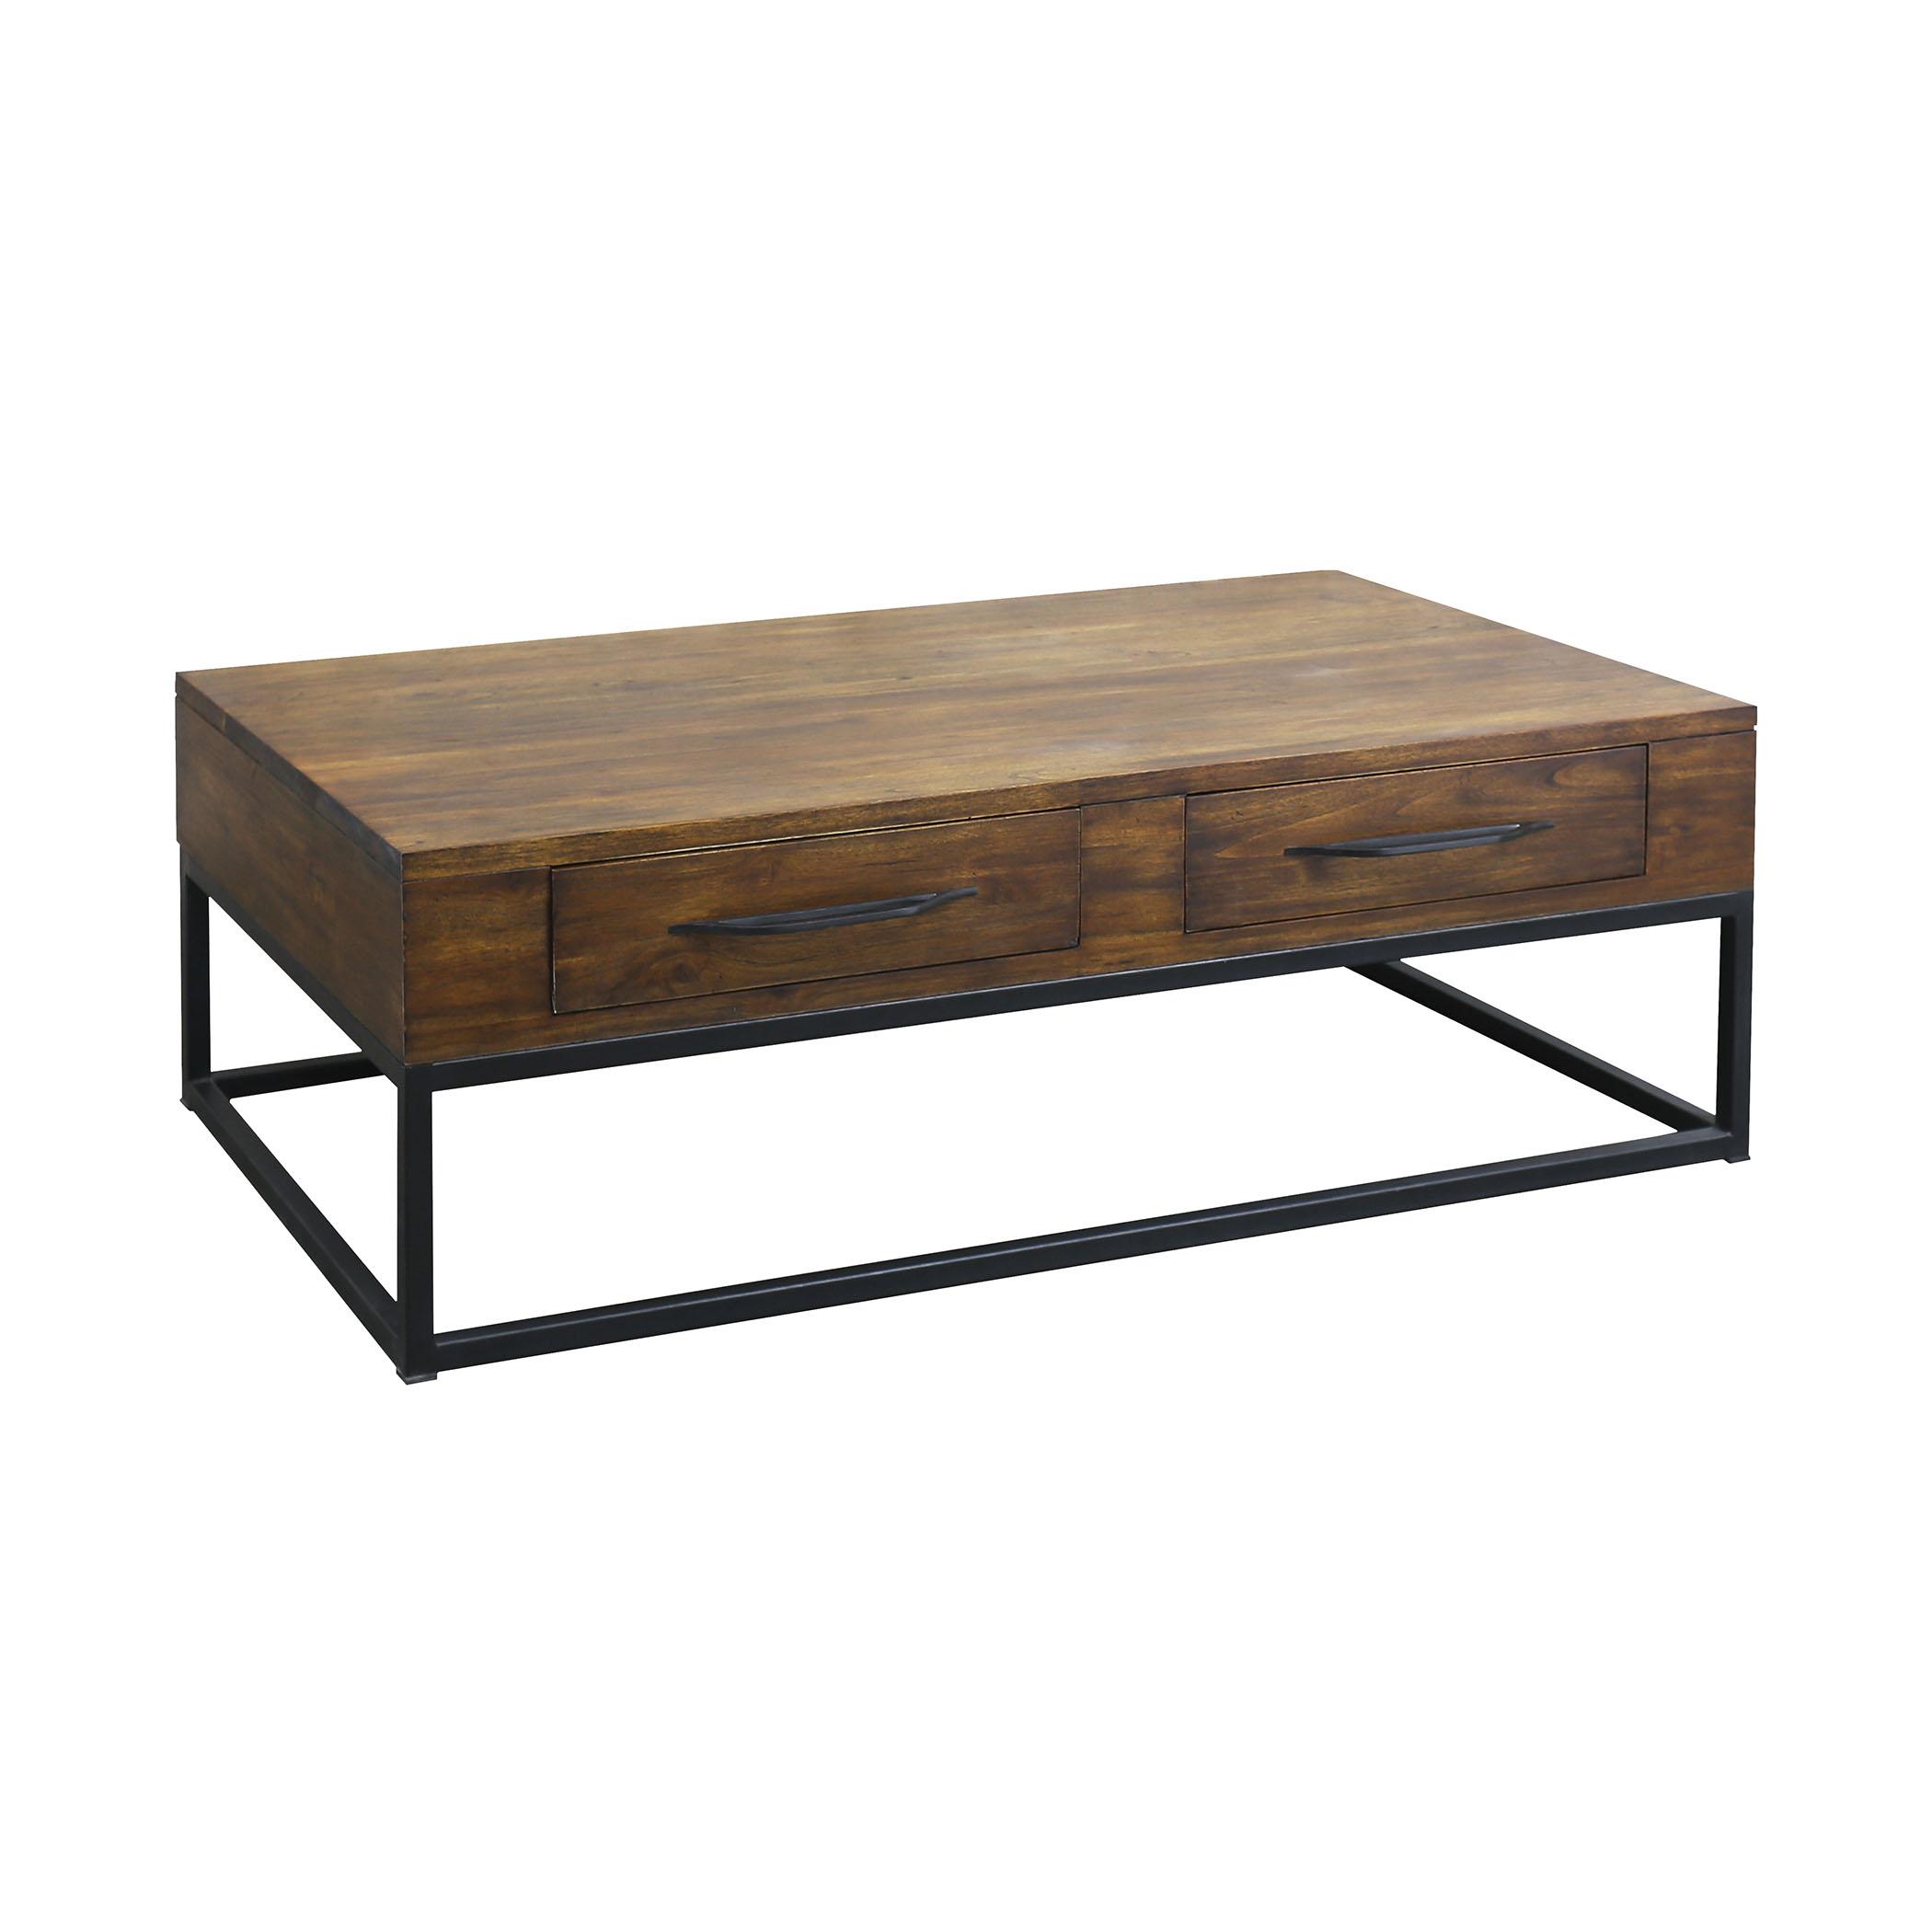 Stanley 2-Drawer Coffee Table in Wood and Metal   Elk Home